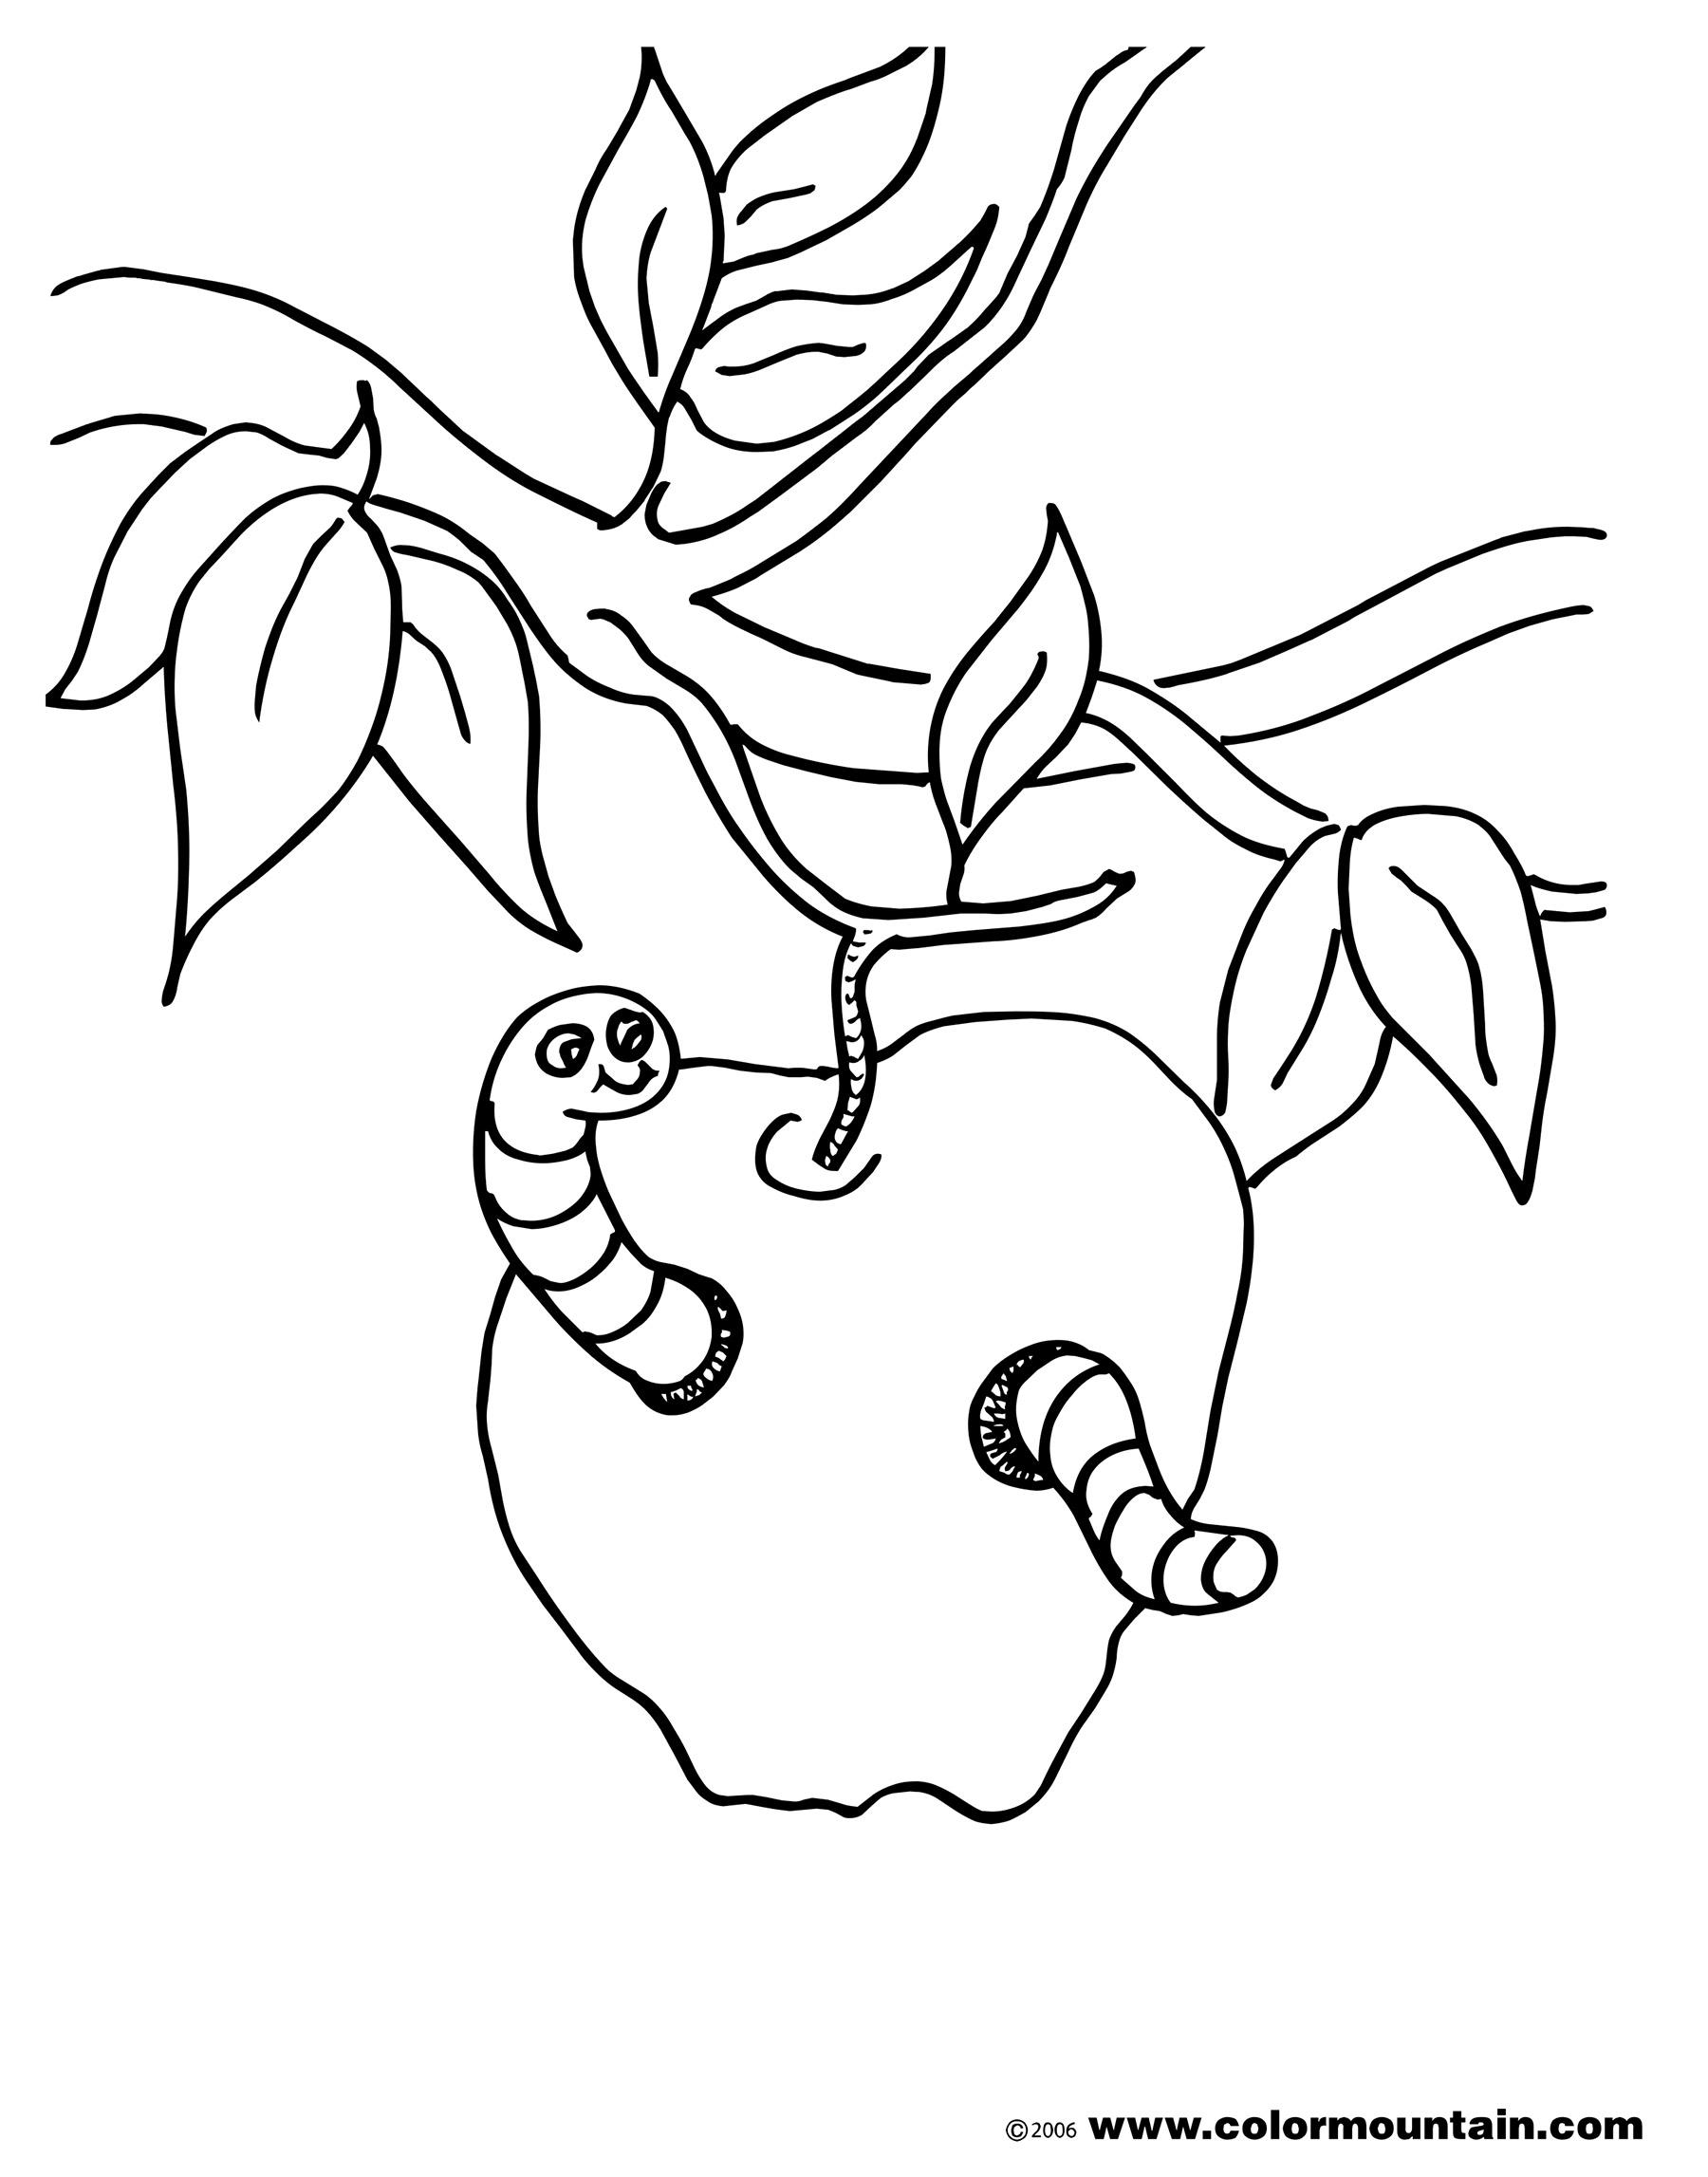 Worm Cartoon Drawing At Getdrawings